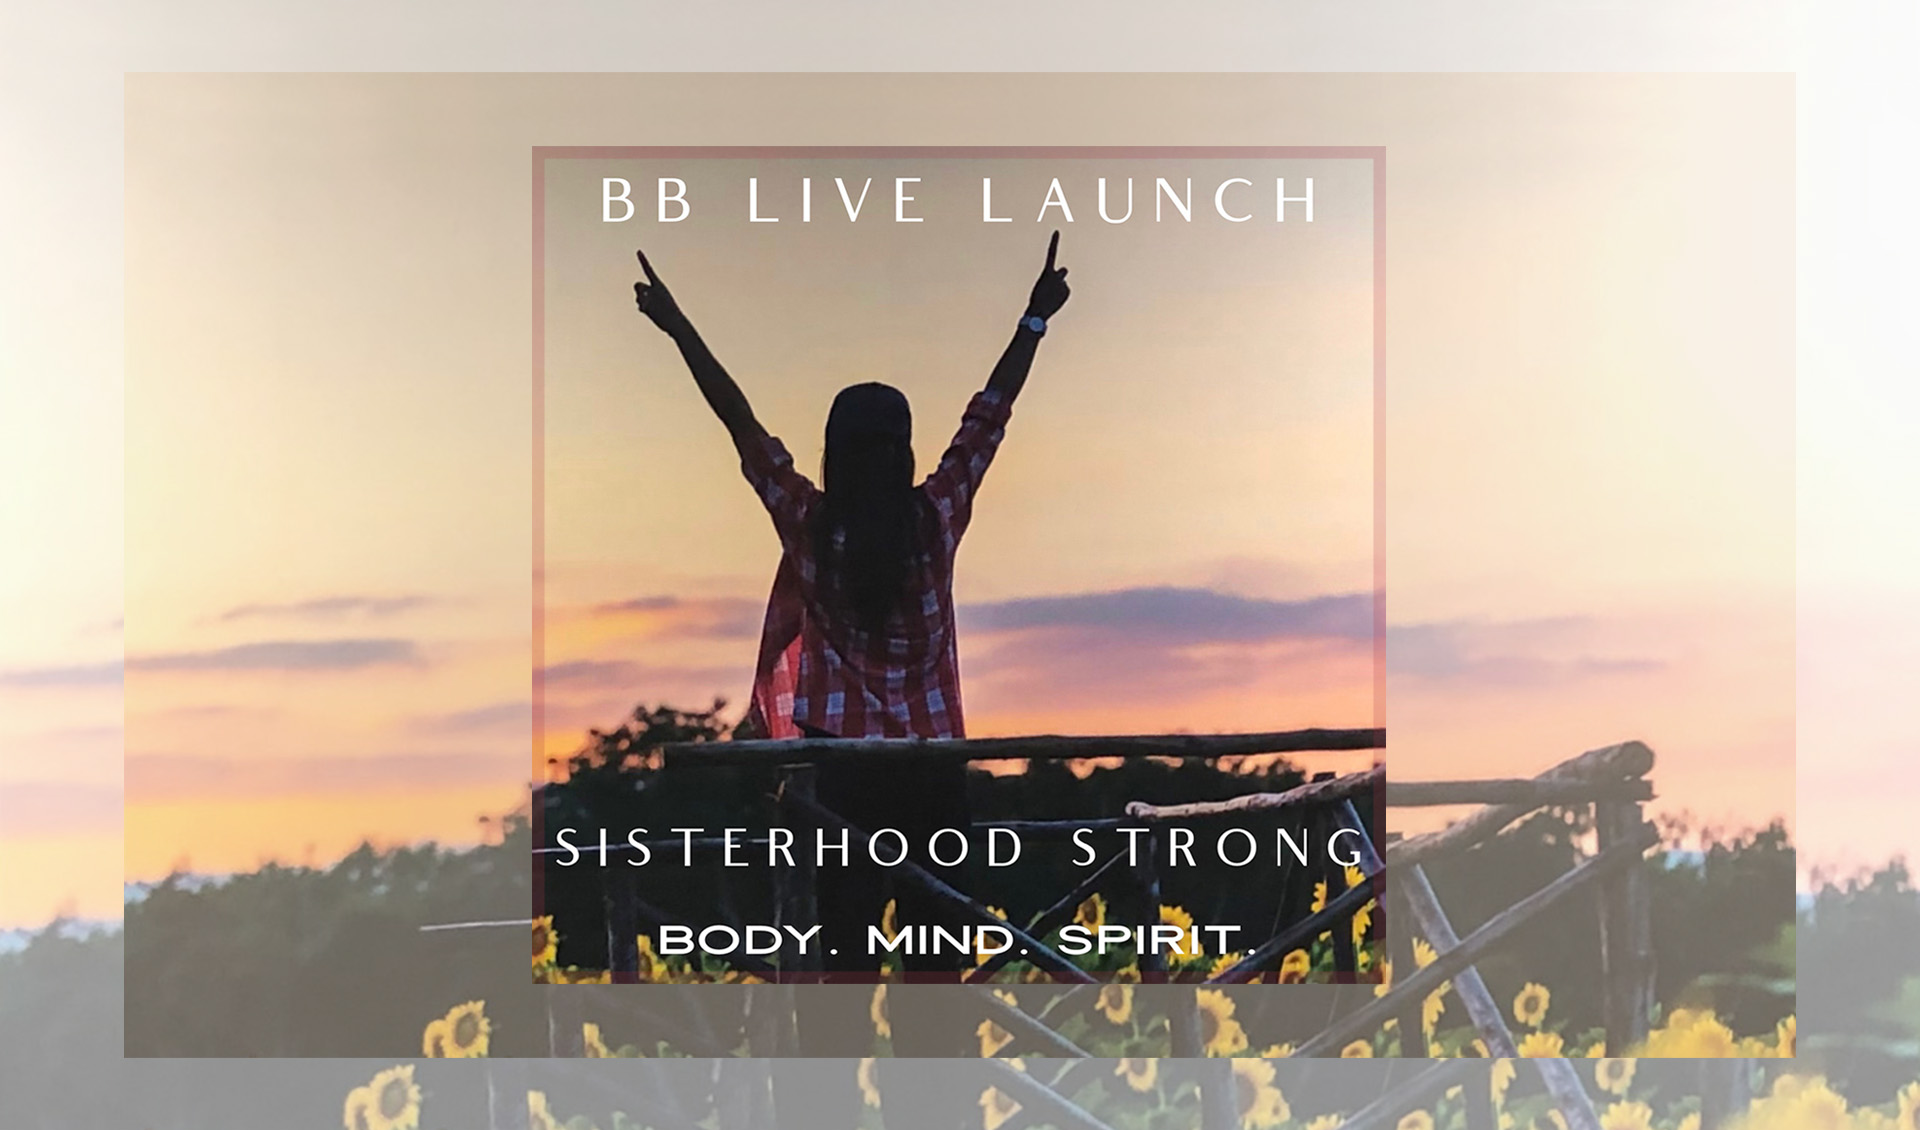 Body Boutique Live Launch - Sisterhood Strong